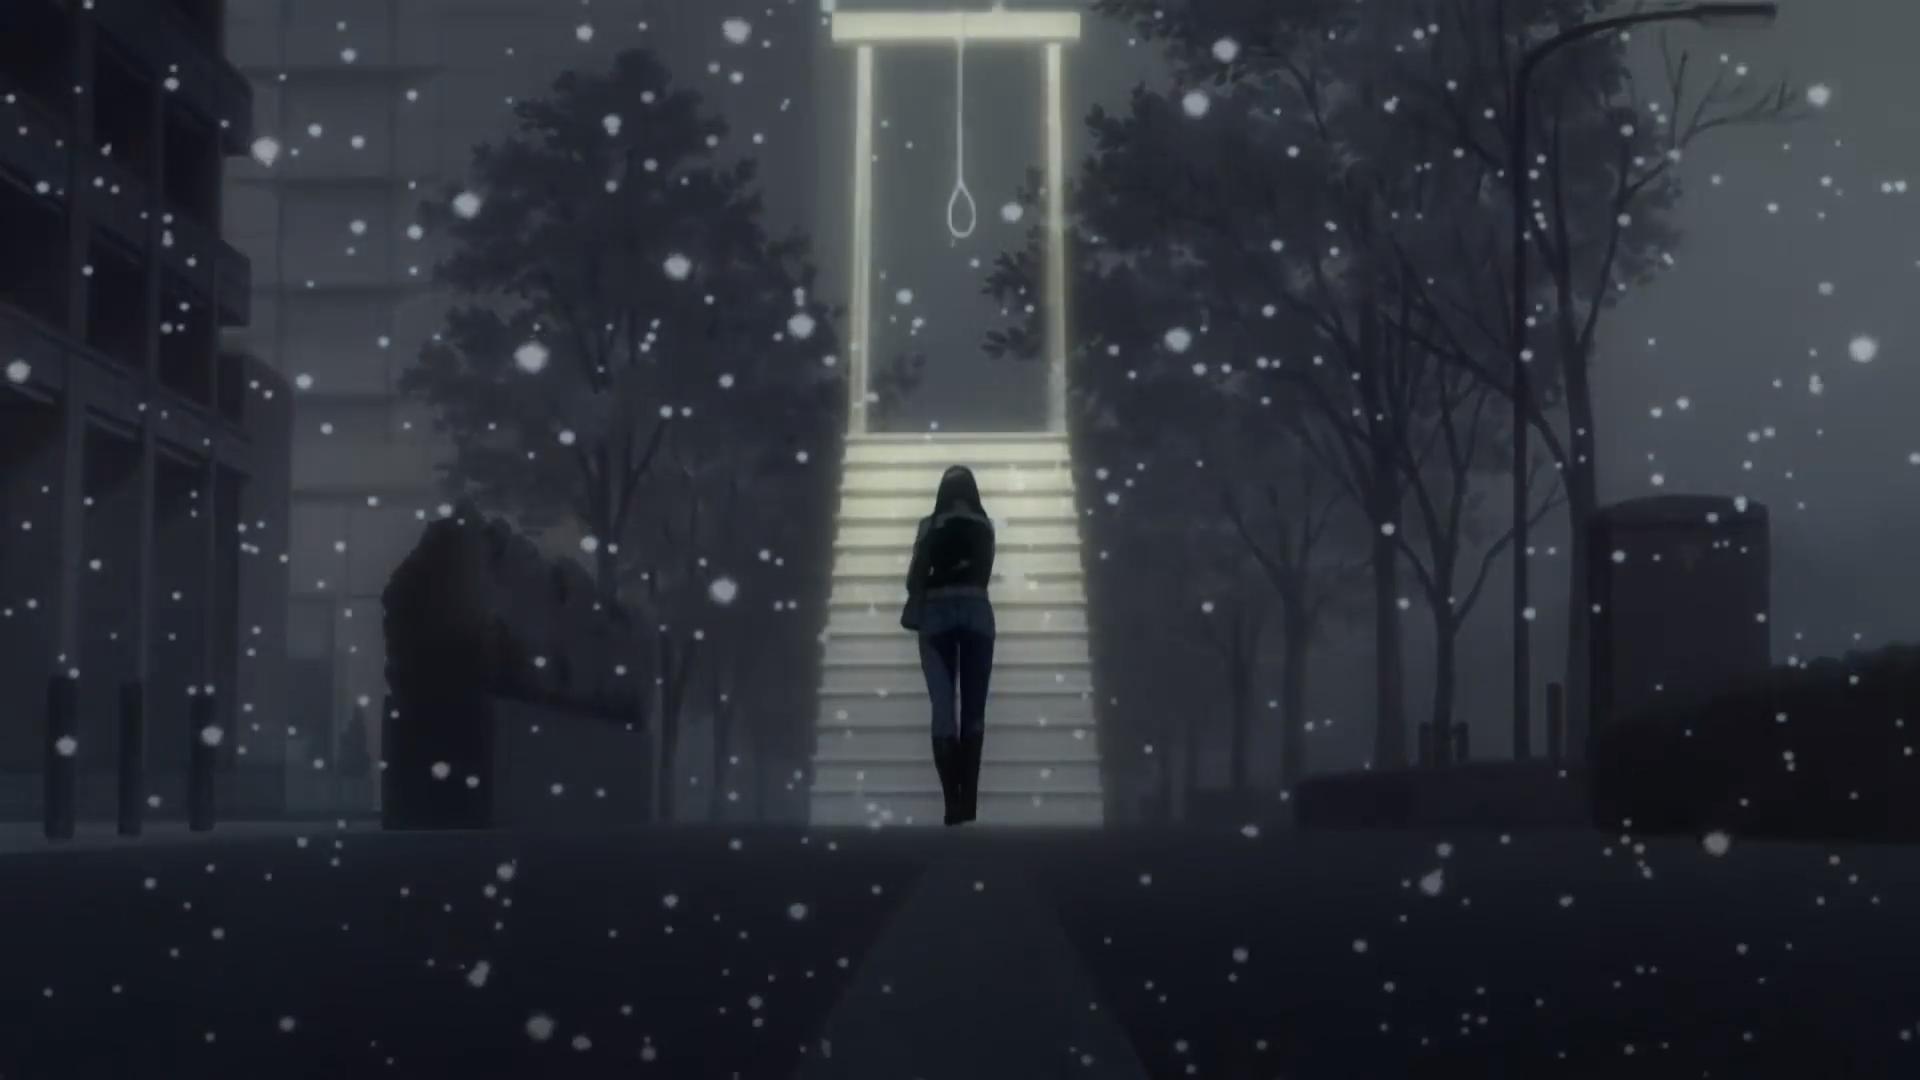 File:NomiMisorasDeath(Anime).png